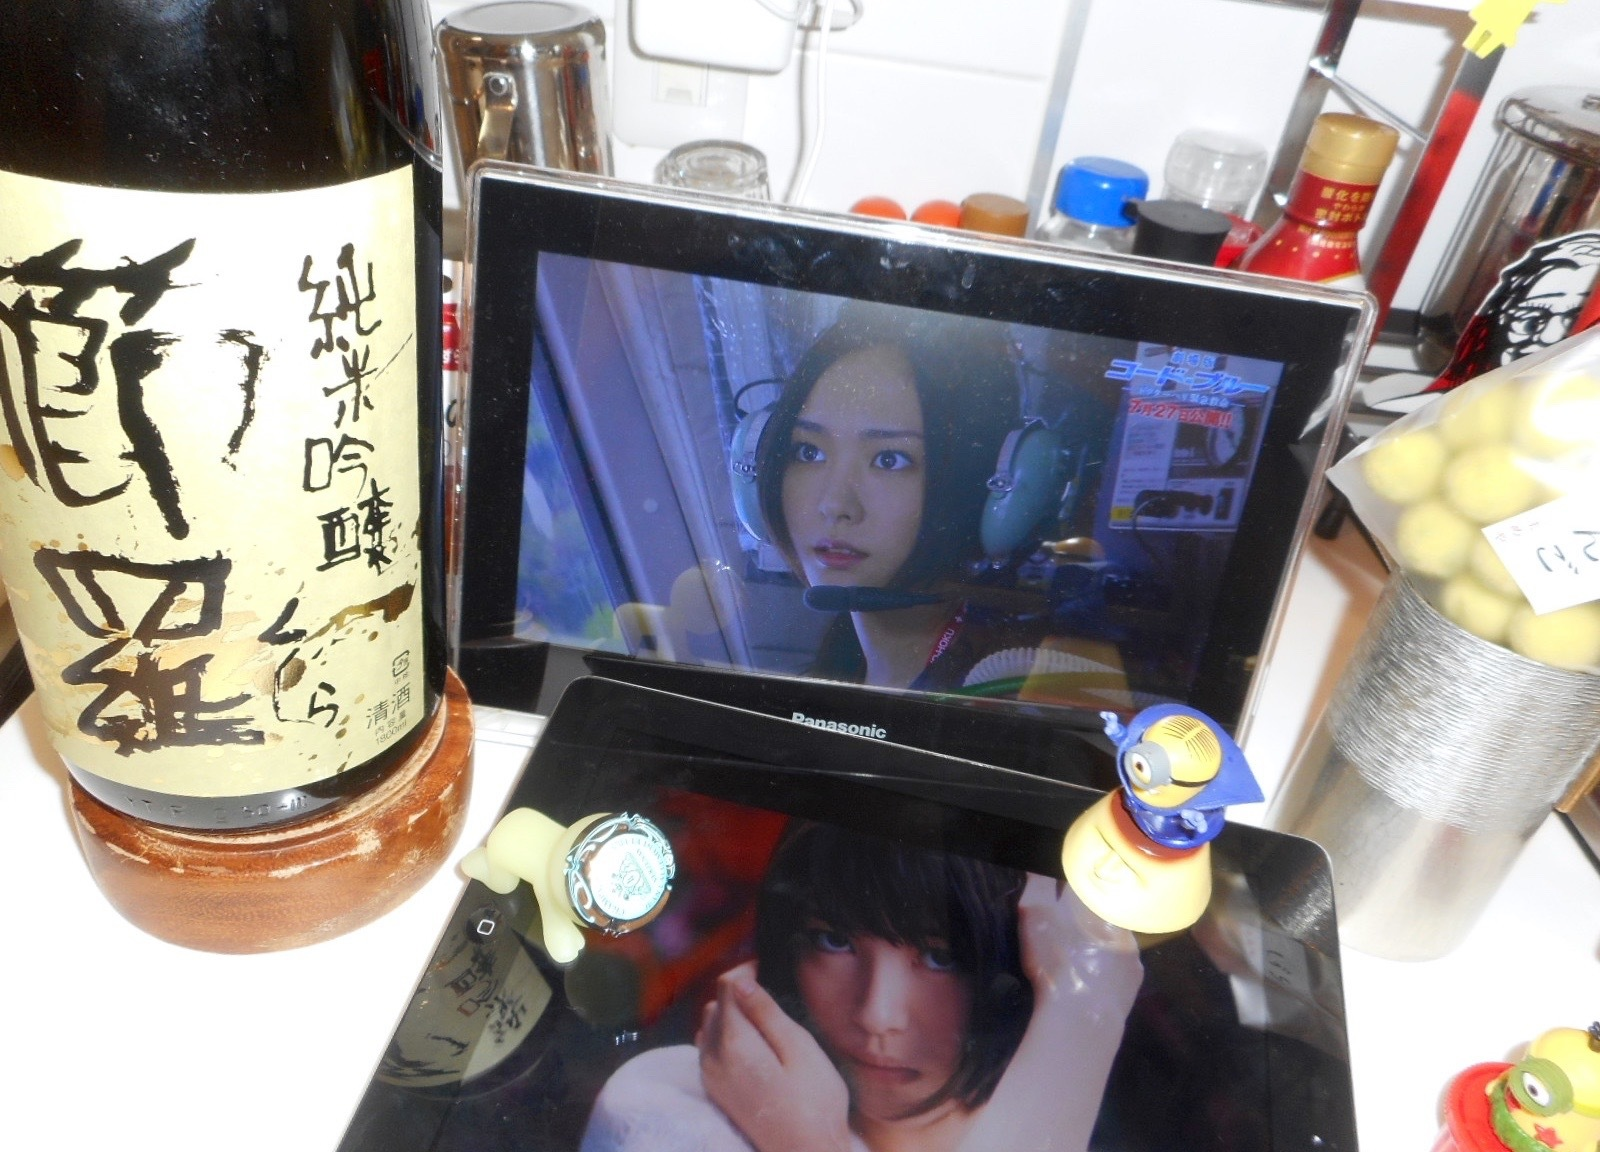 kujira_jungin29by2_1b.jpg